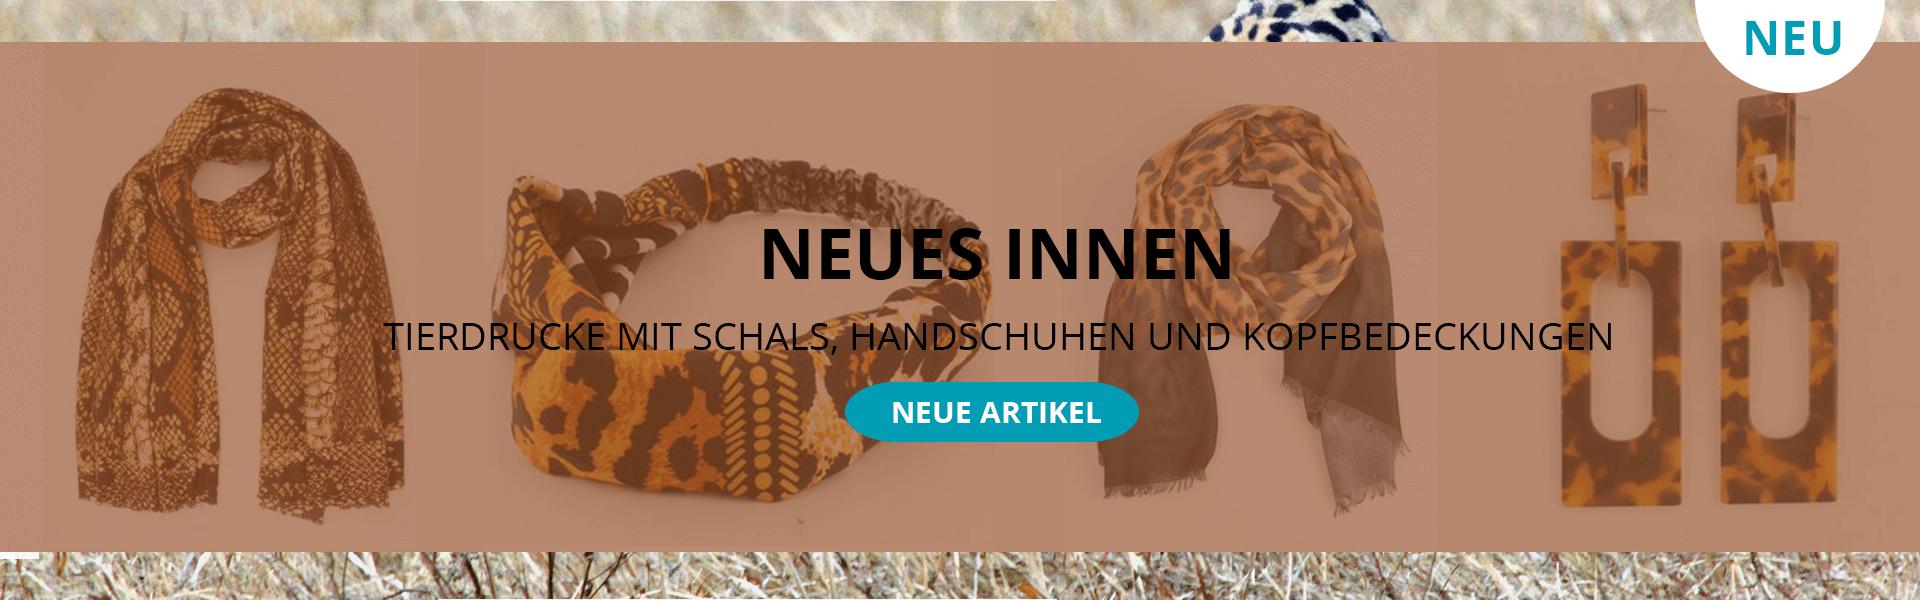 Mode Accessoires & Schmuck Großhandel - Taschen - Schals - Handschuhe & Bijoux banner 3